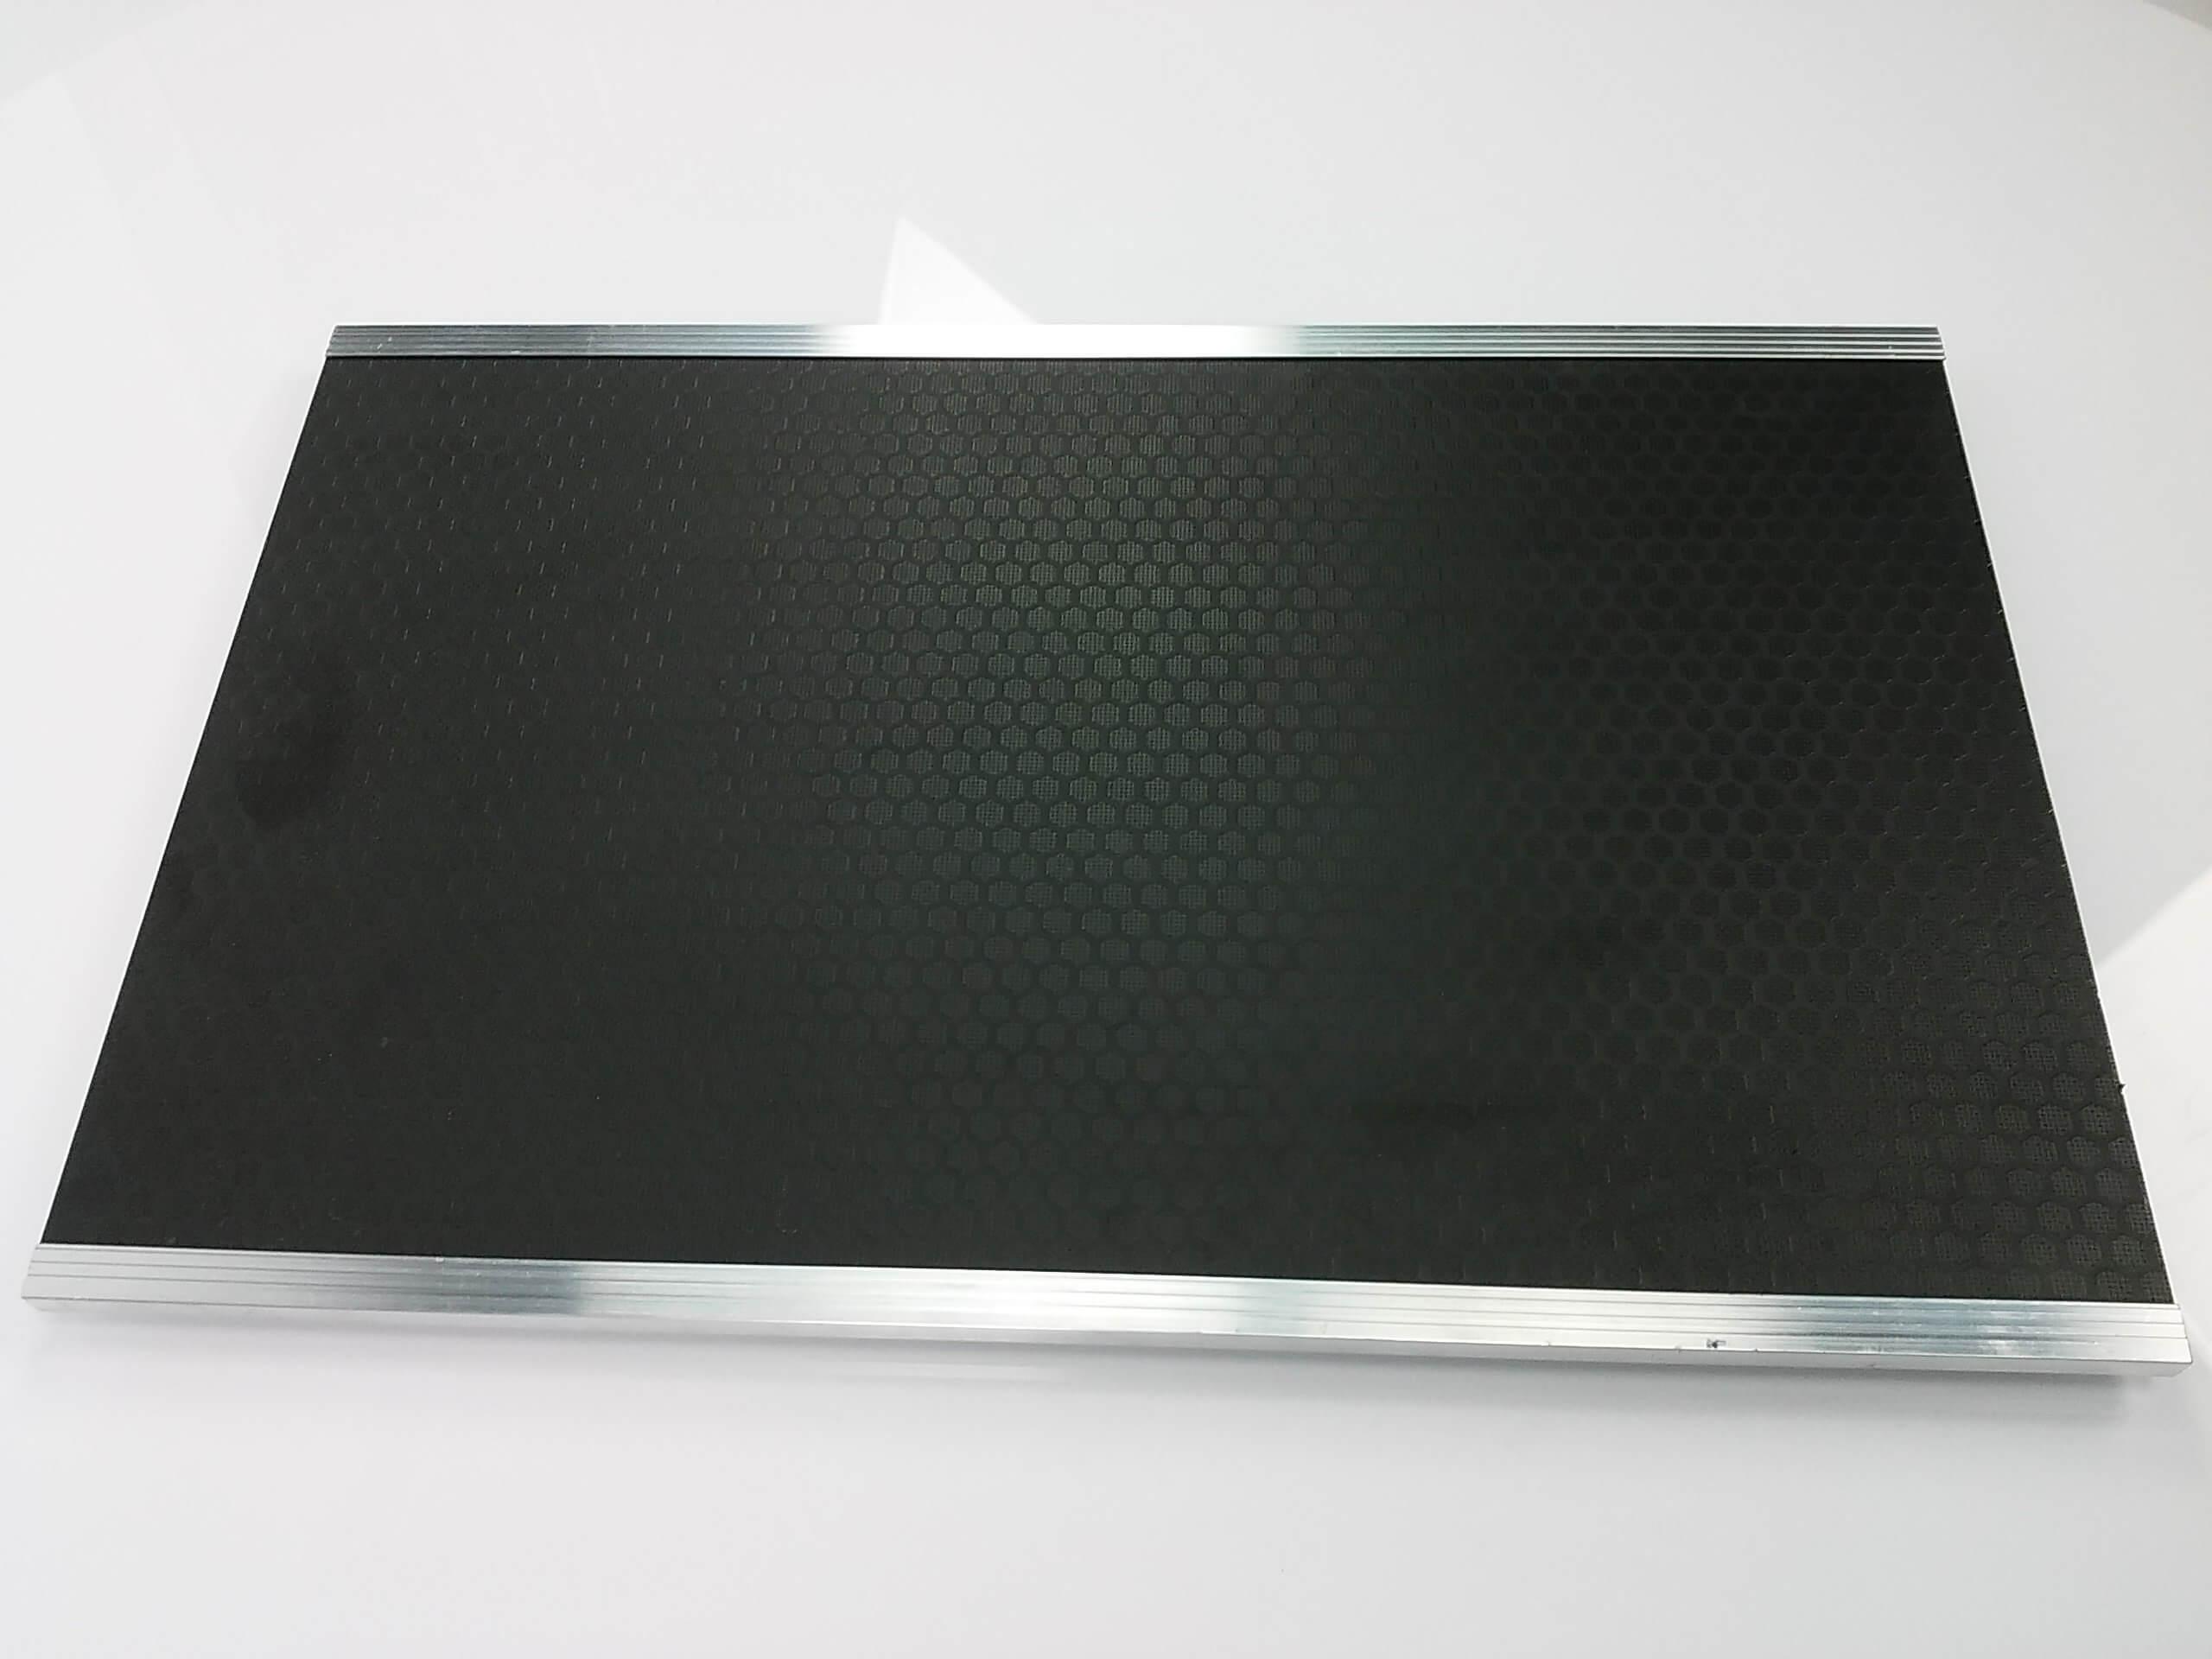 Black Desk Shelf for 4ft Deckstand